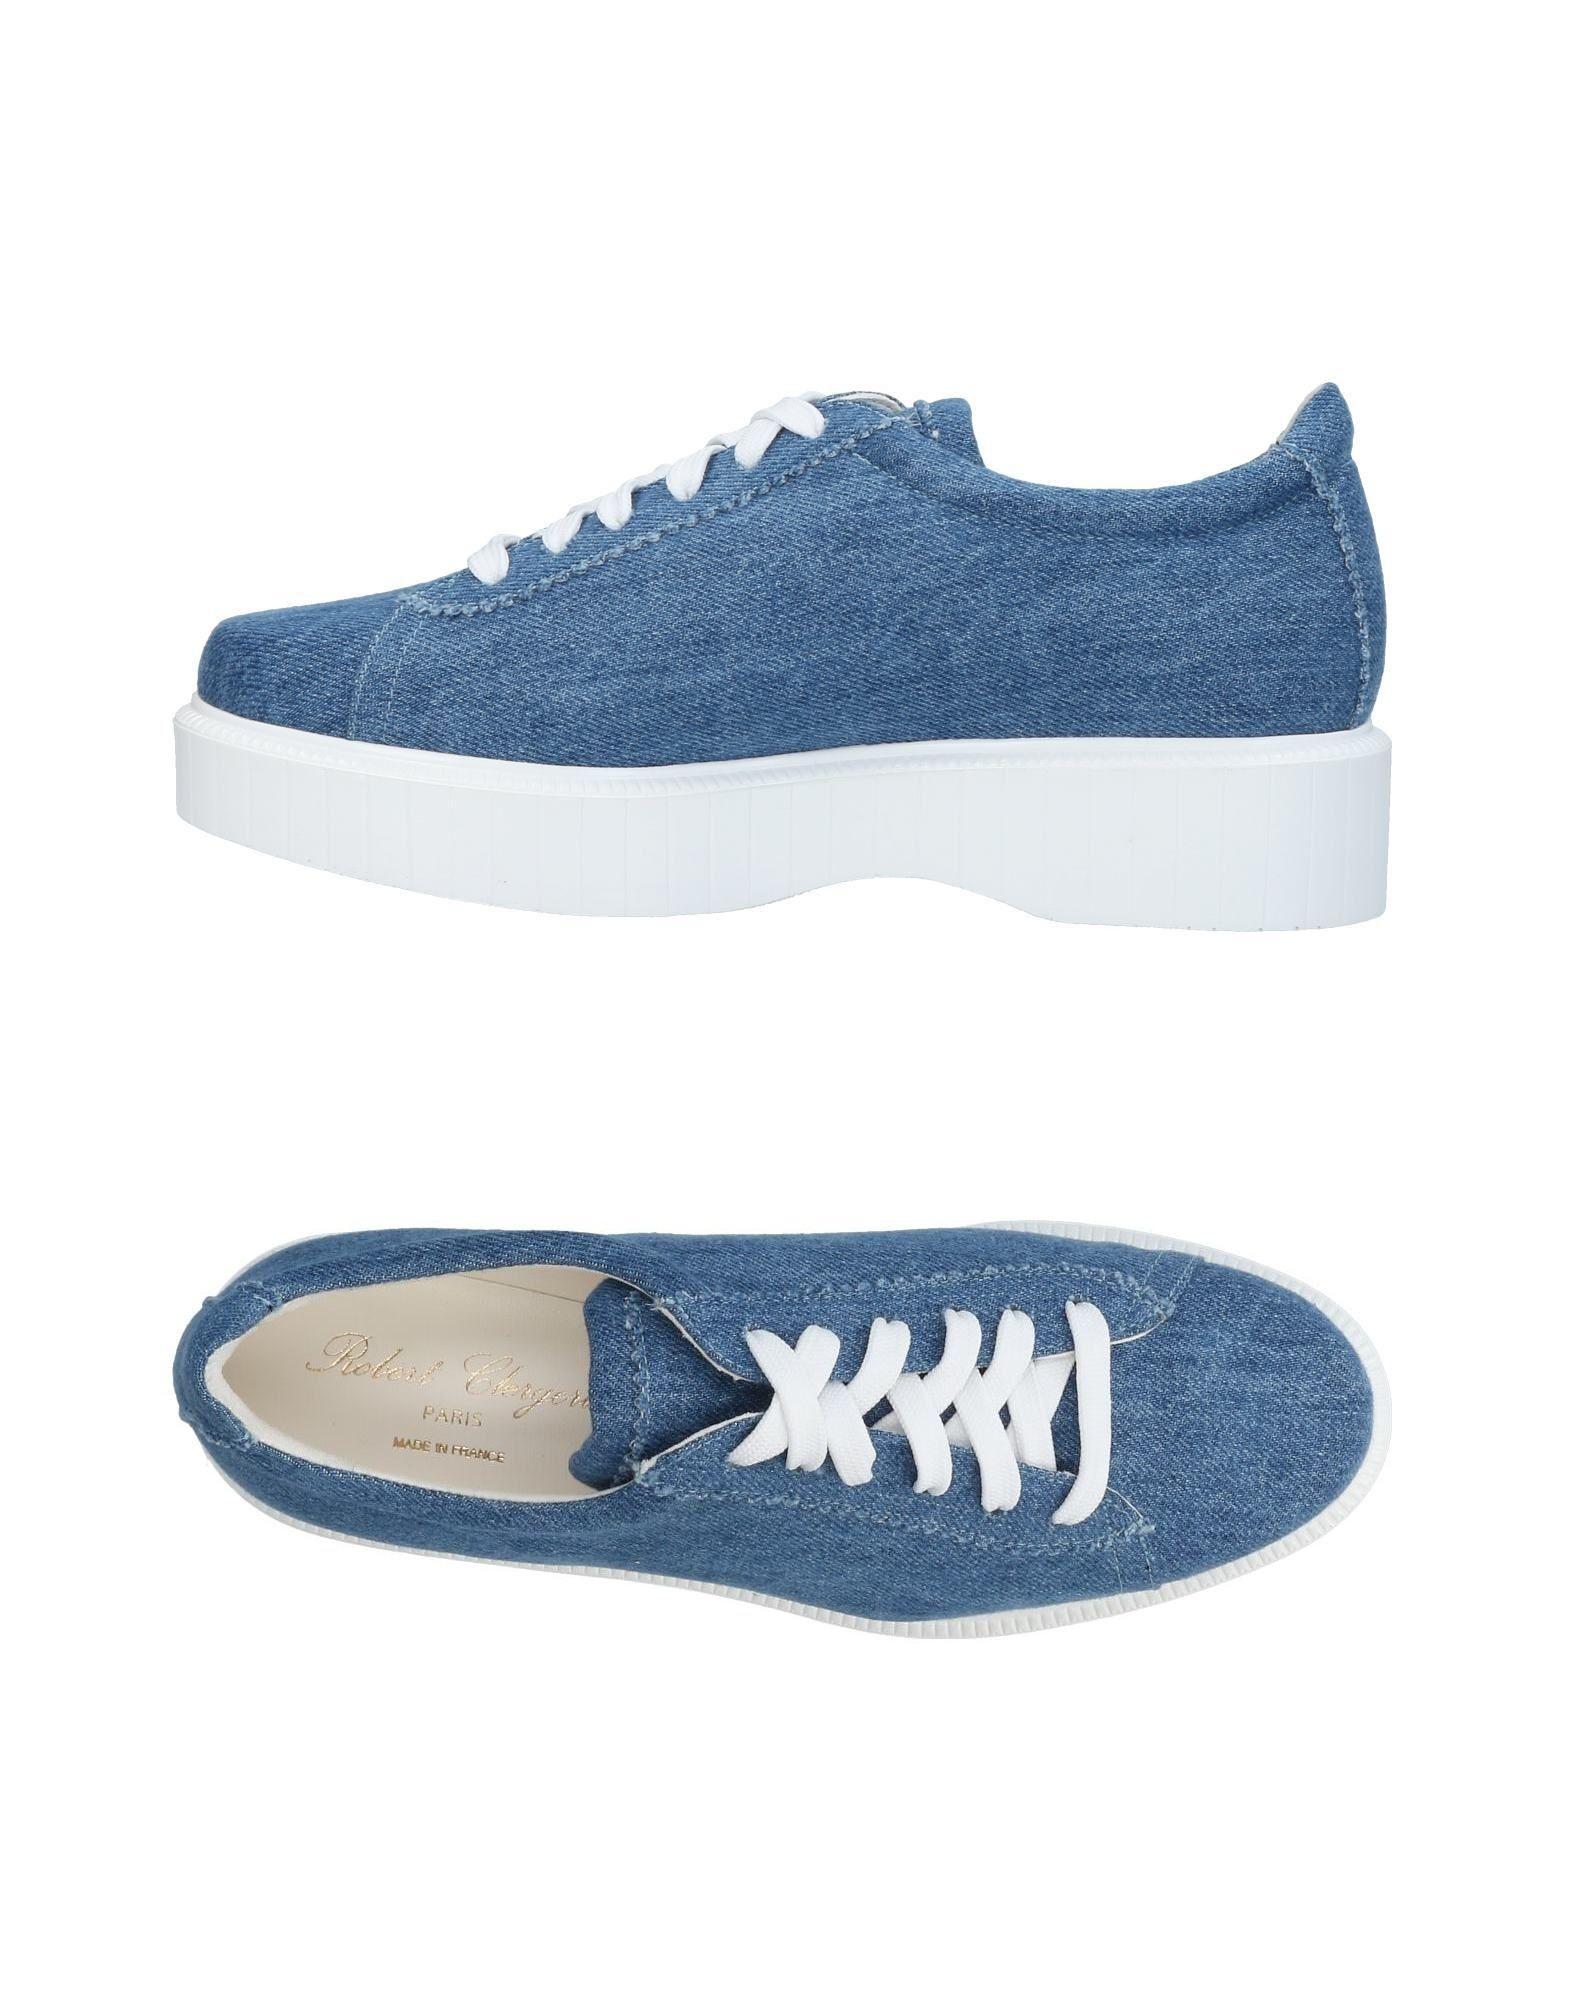 Sneakers Robert Clergerie Donna - Acquista online su